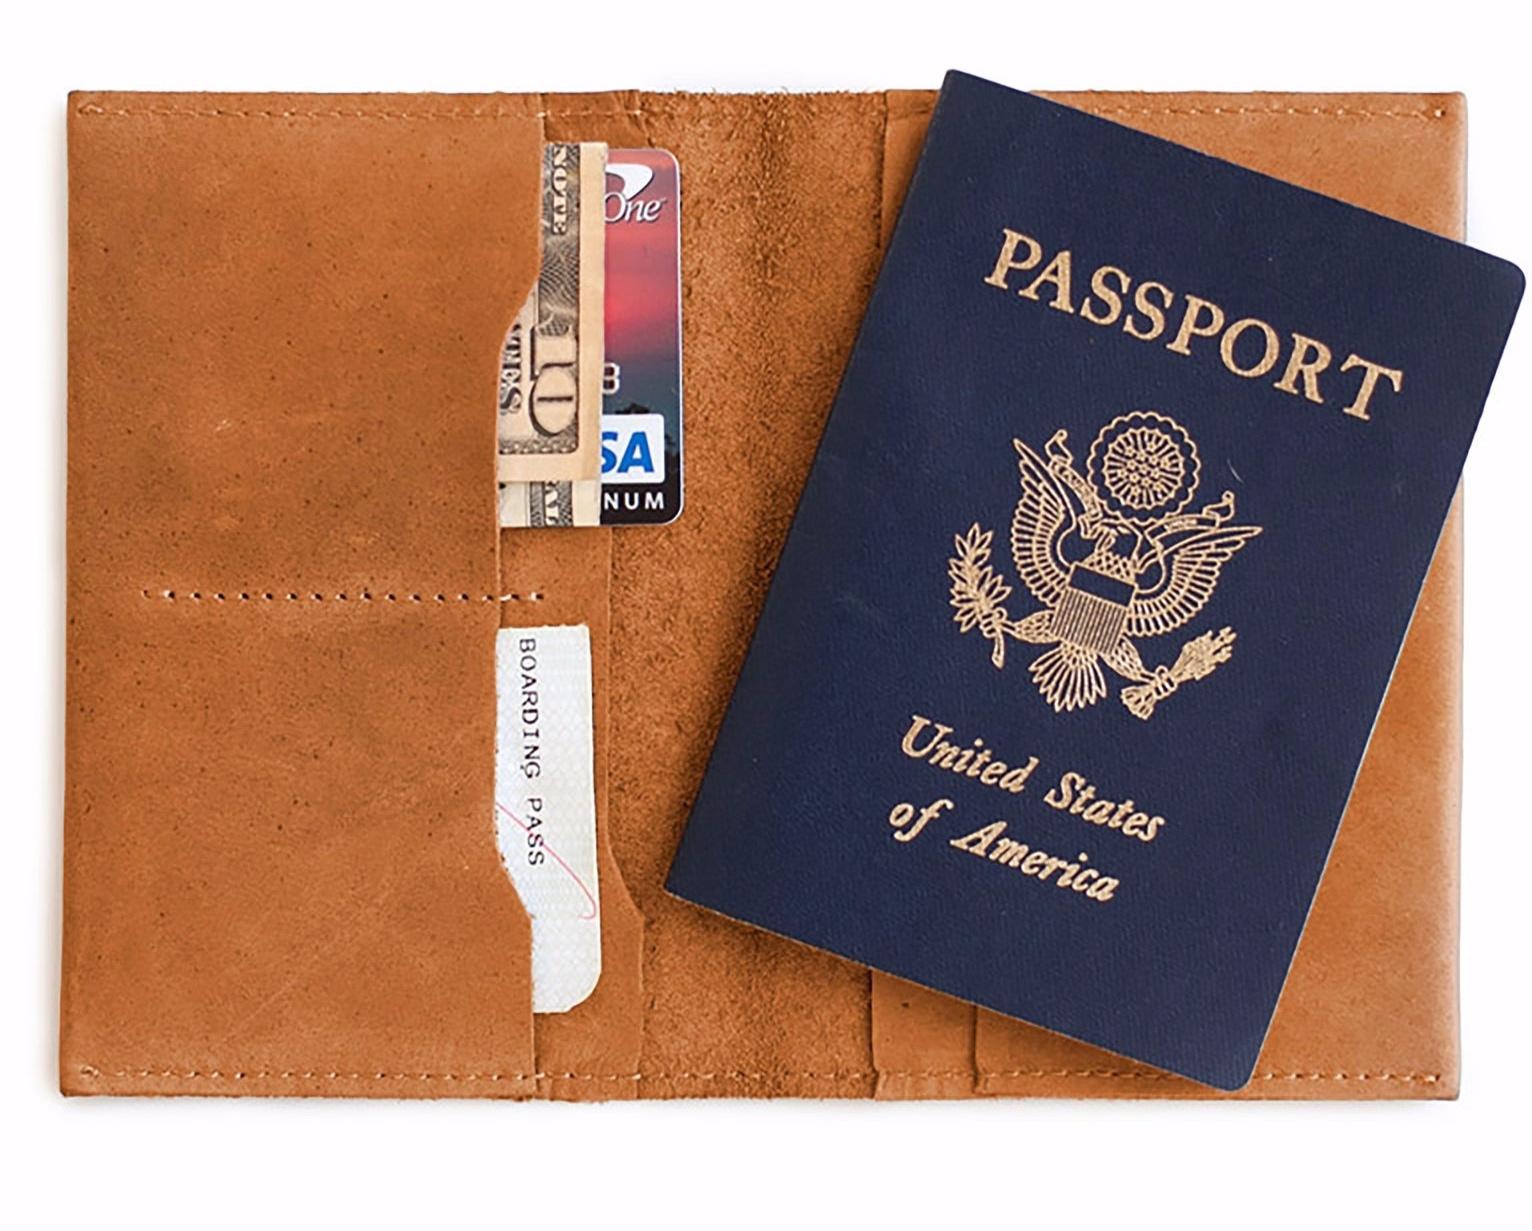 ABLE, Passport Wallet $35